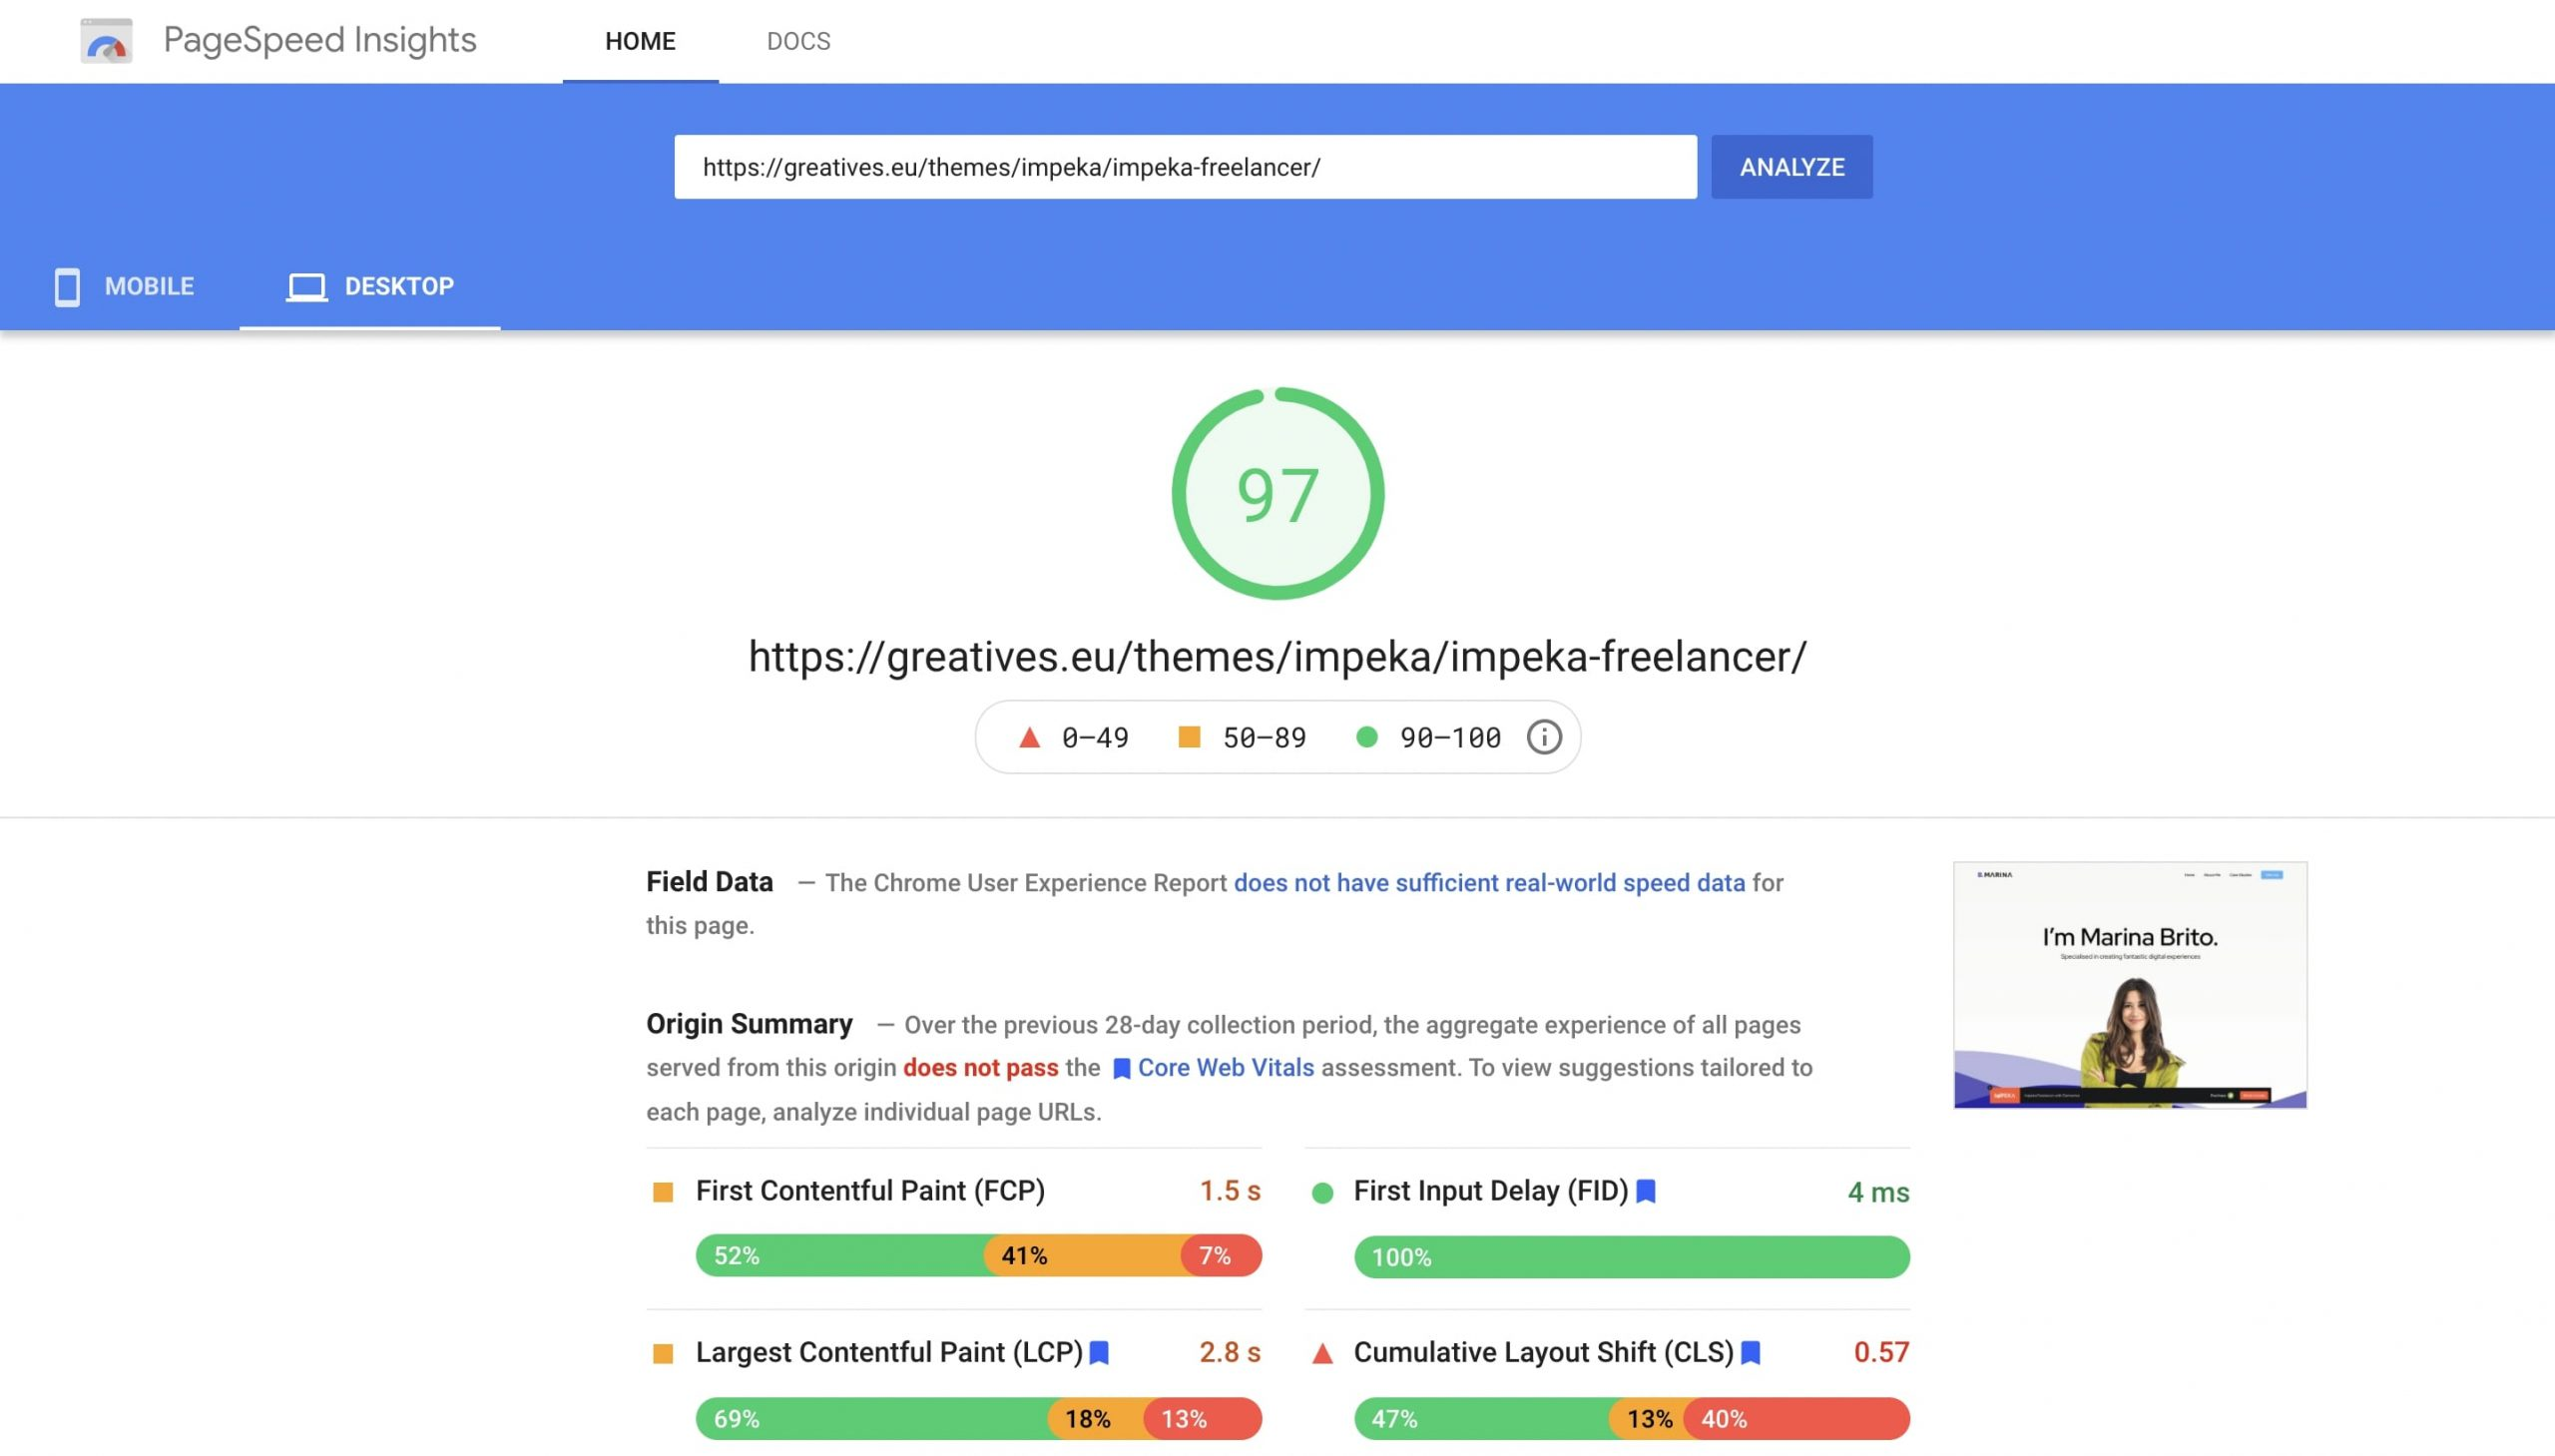 Impeka Freelancer on PageSpeed Insights